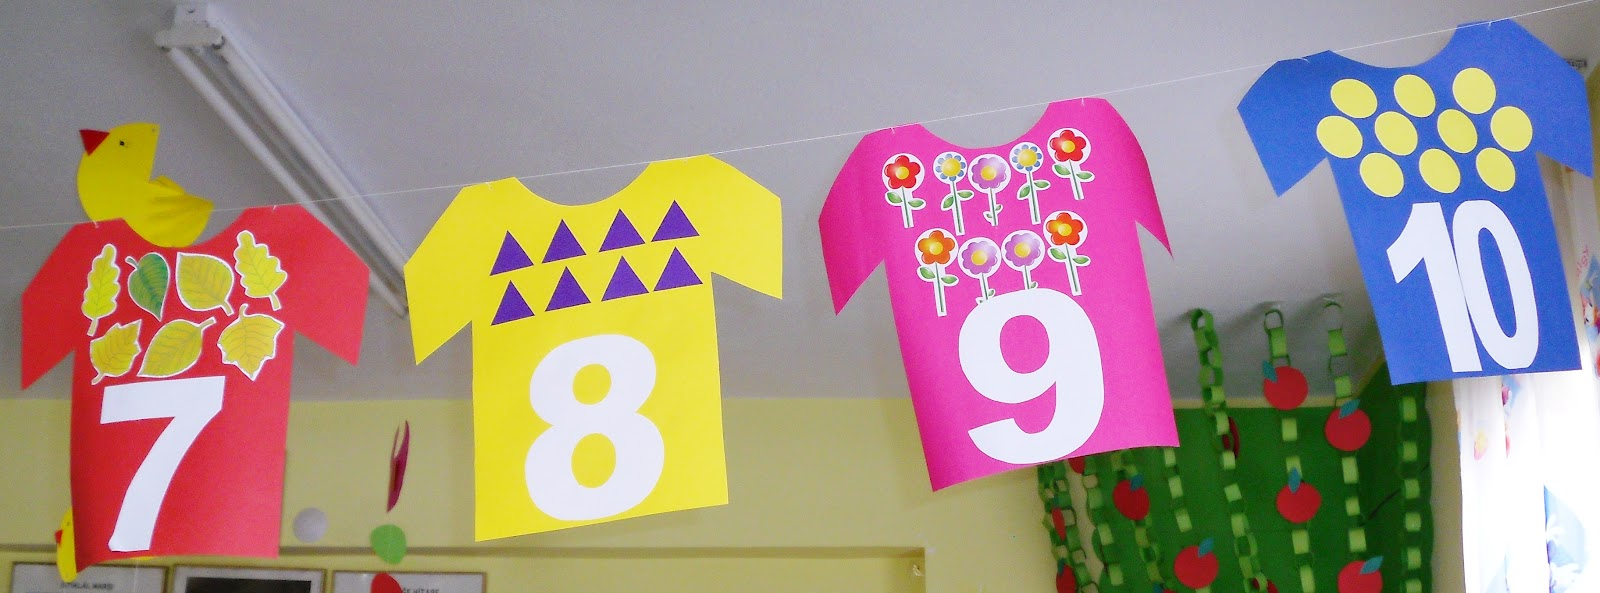 Number craft Funny crafts